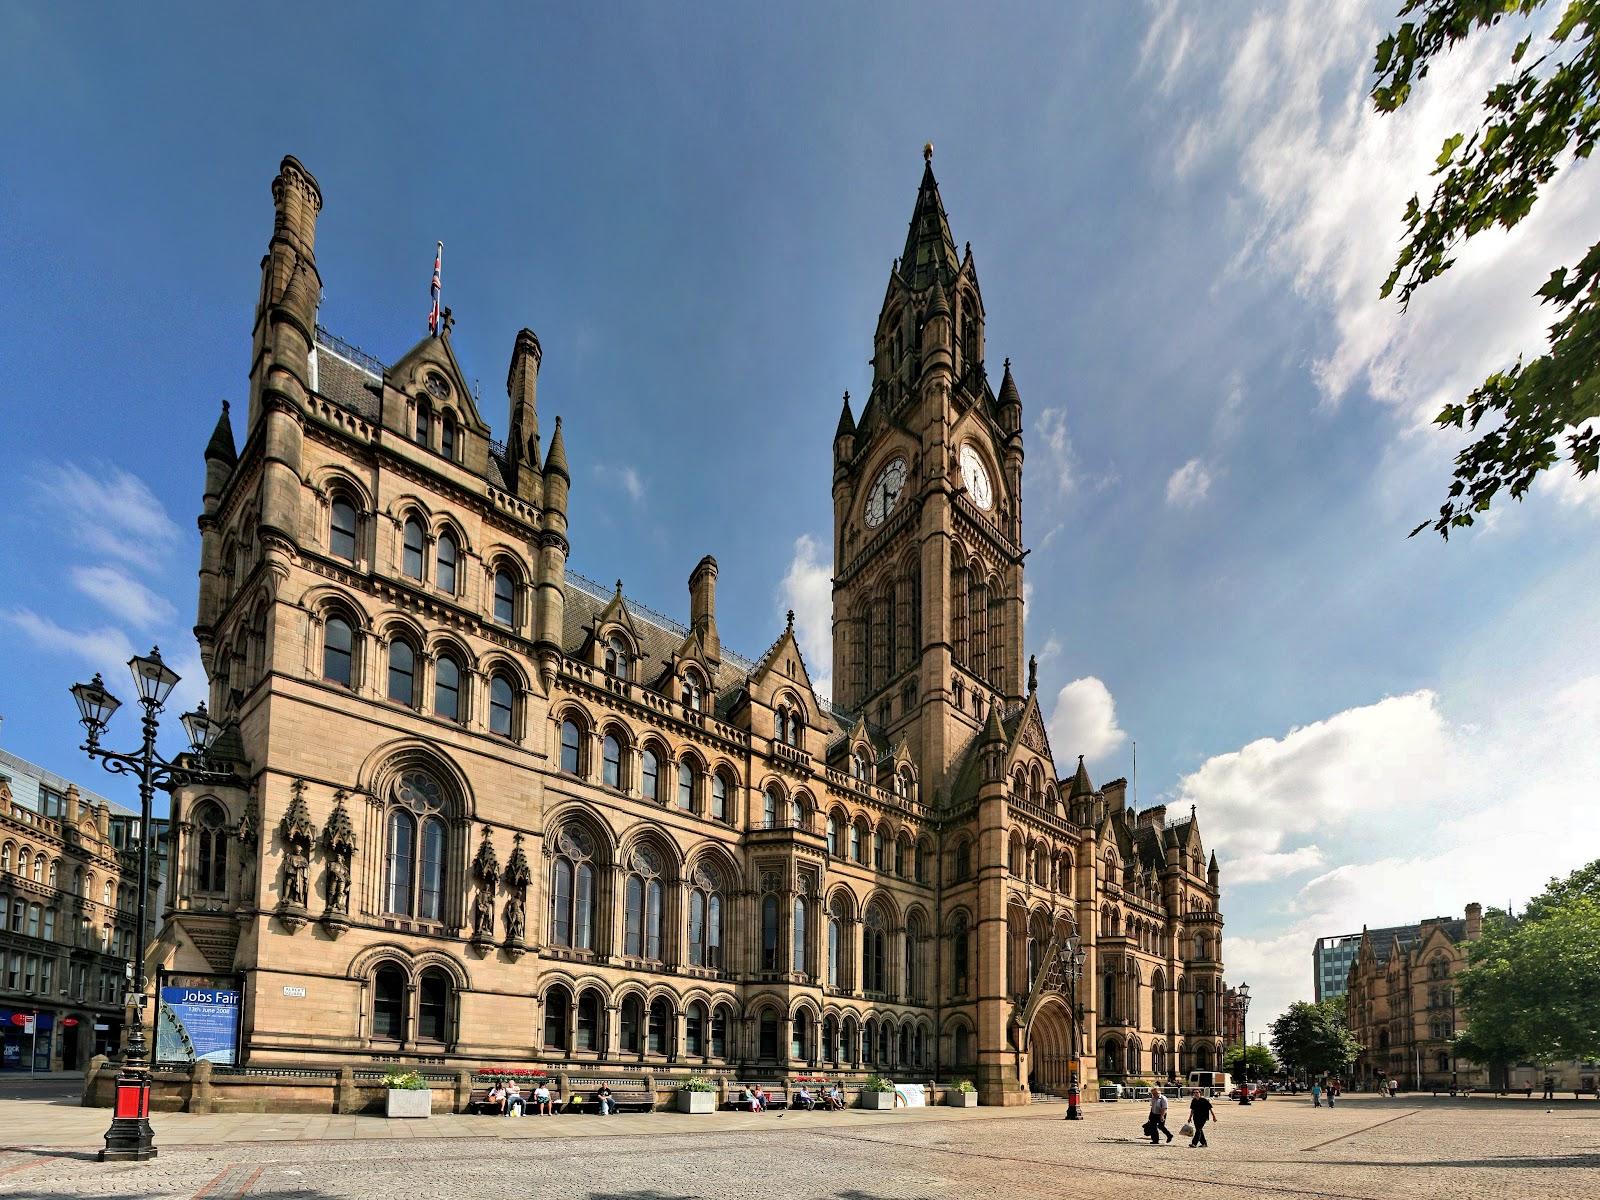 Manchester Town Hall karya Alfred Waterhouse - source: zh.wikipedia.org